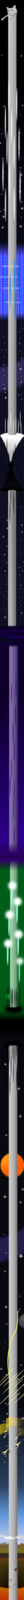 Ultra_Longcat_by_SpaceManPLUSPLUS.png